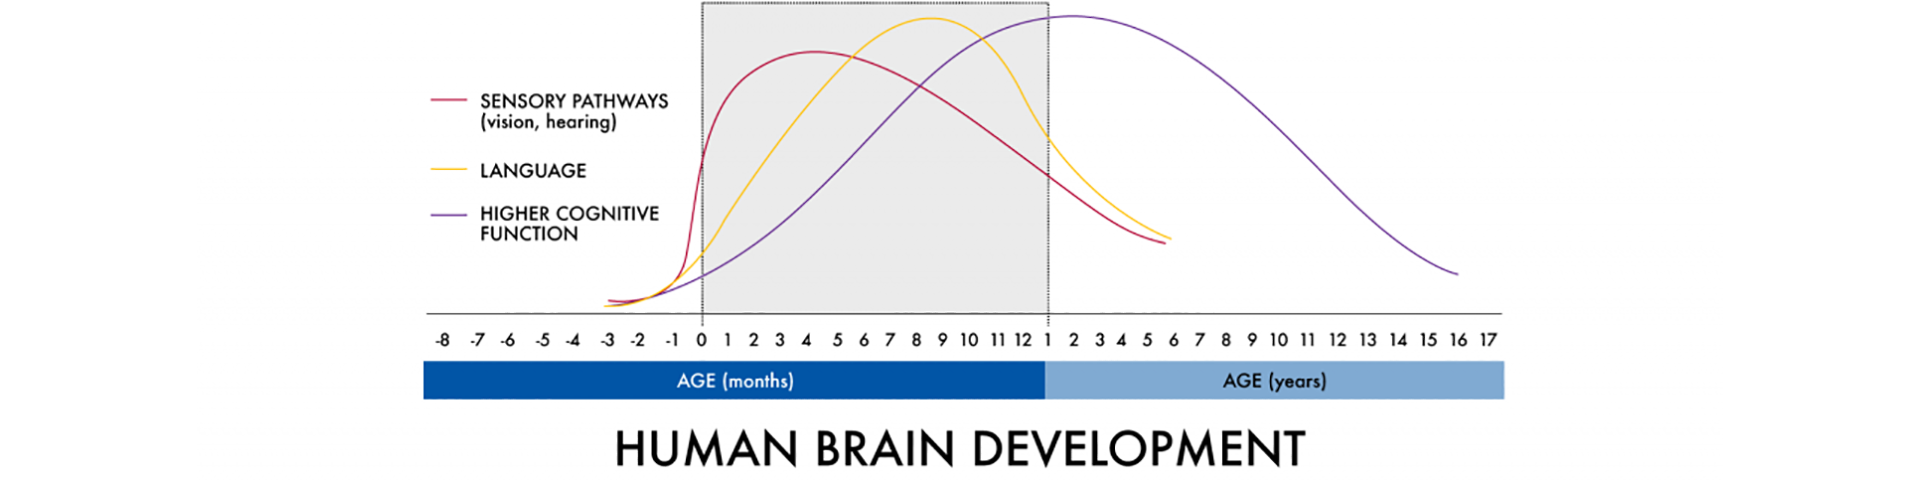 Human Brain Development chart